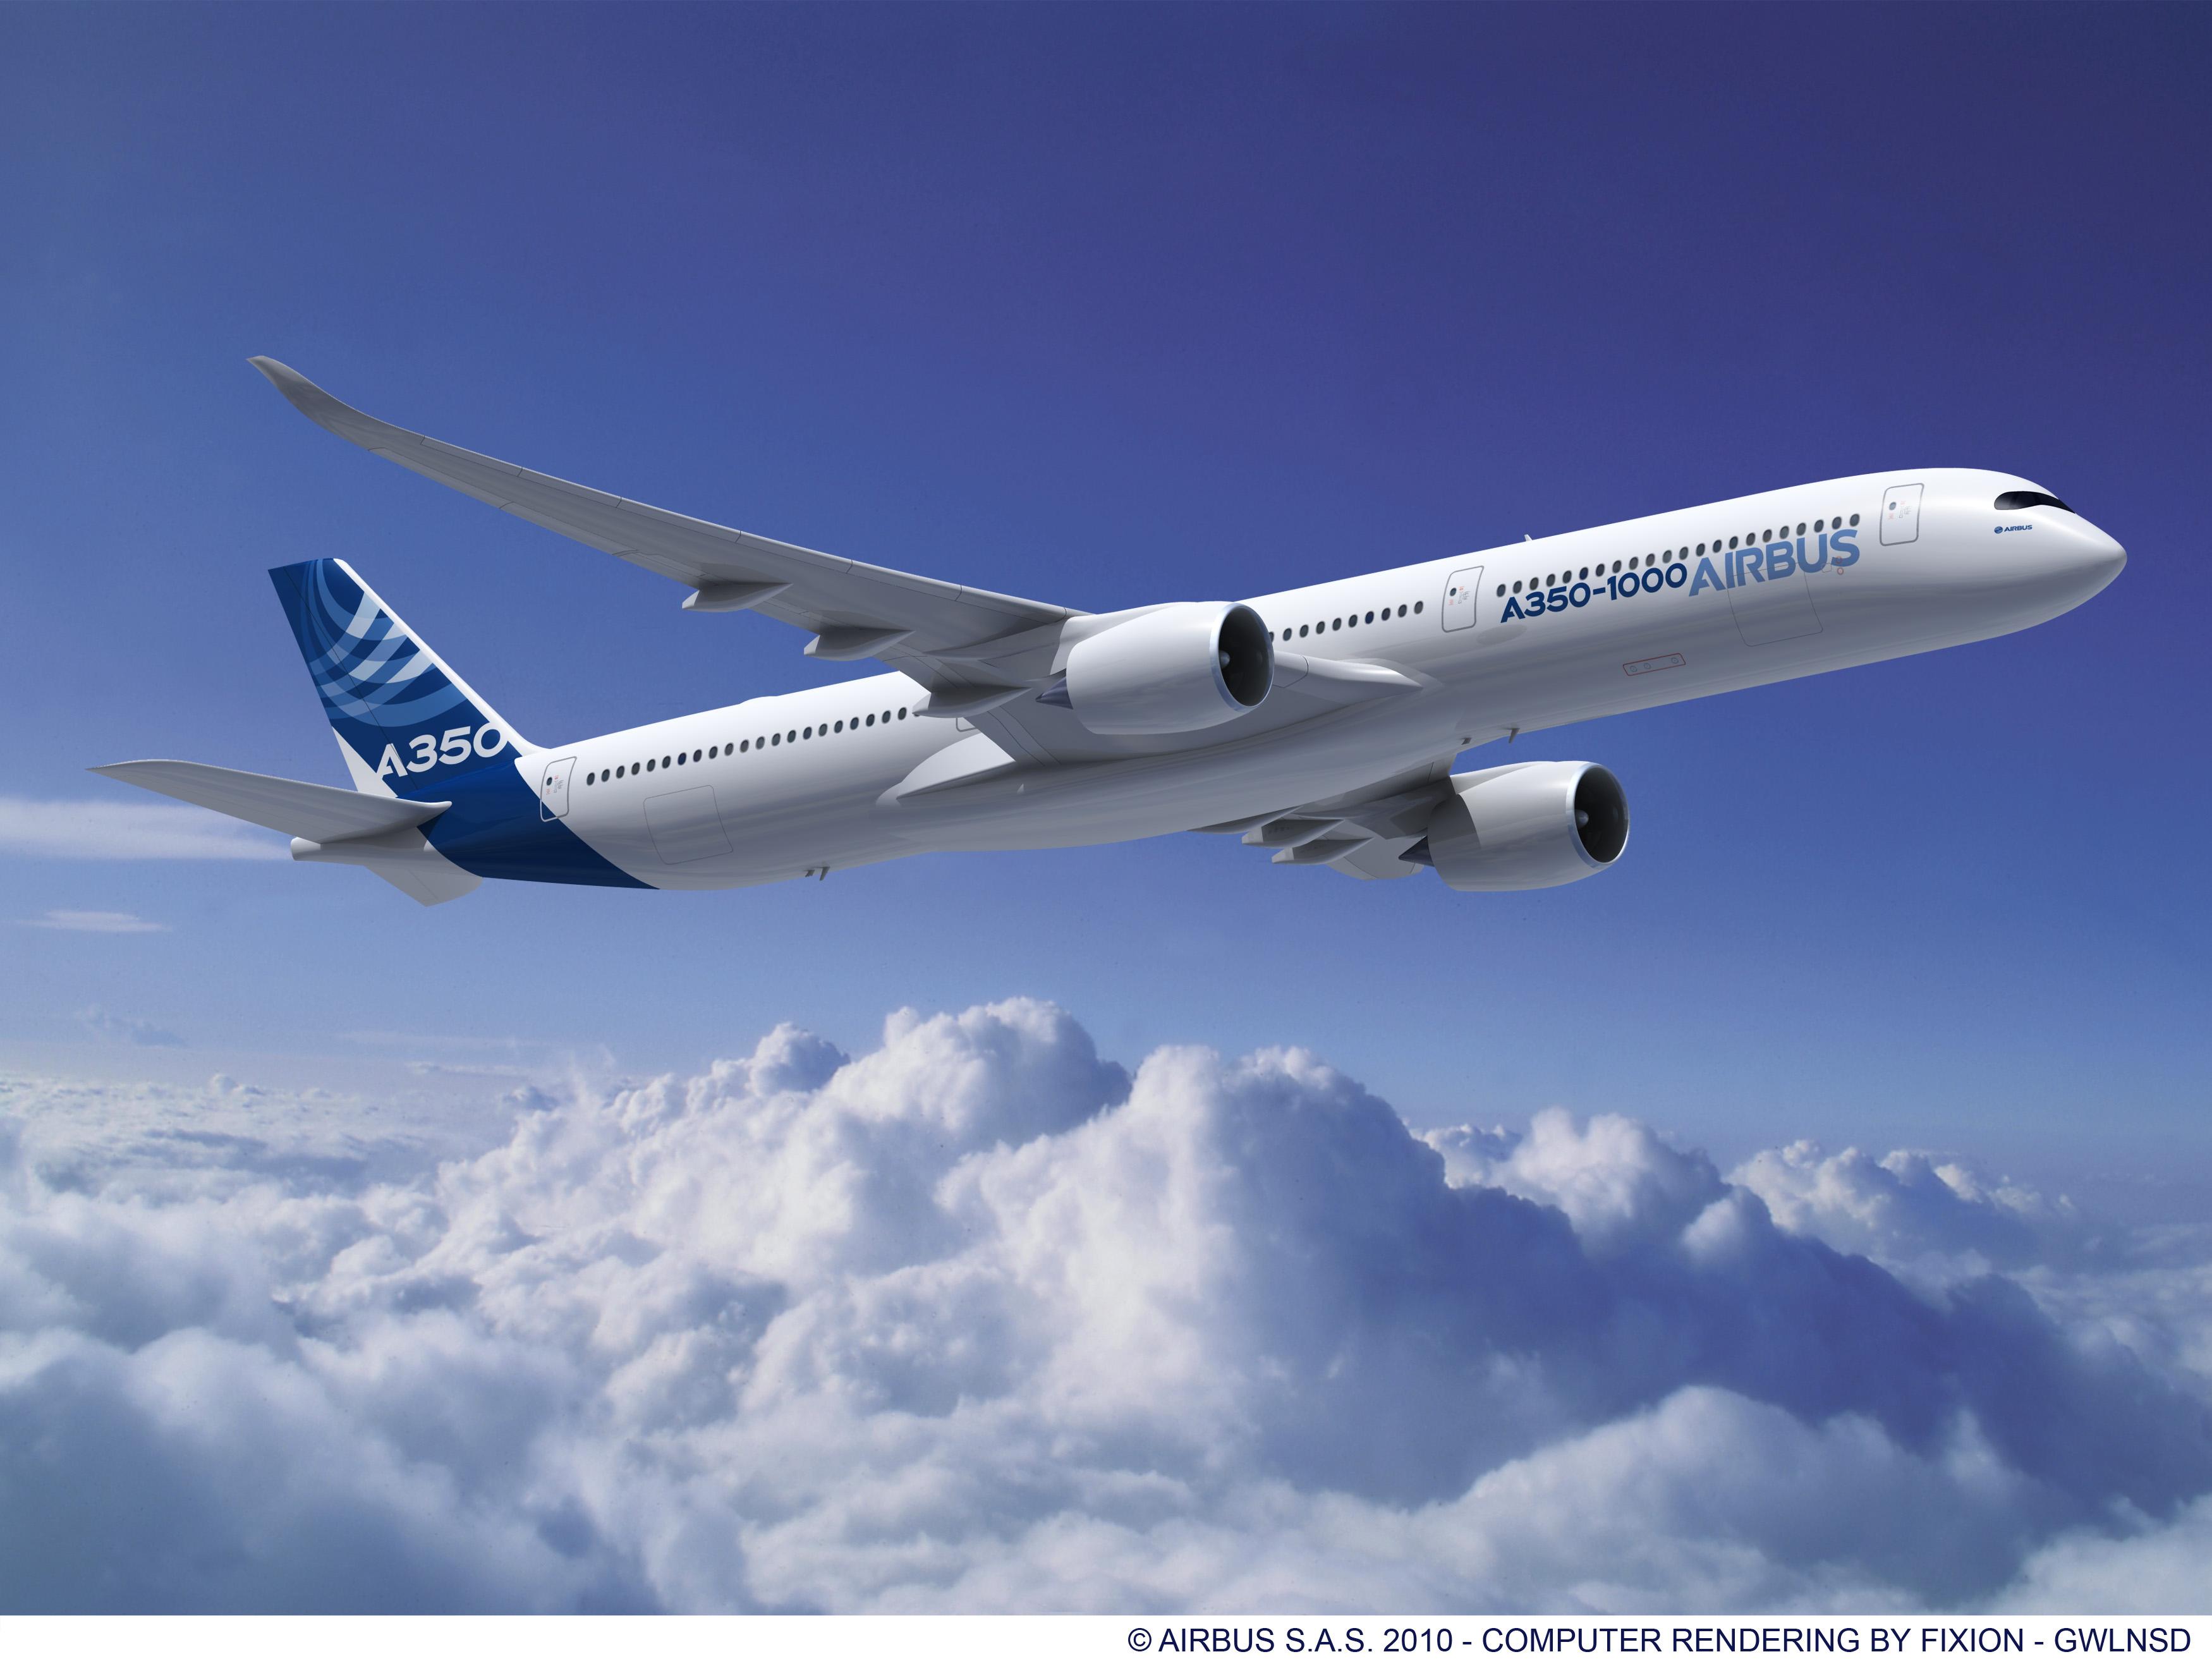 A350-1000_RR_AIRBUS_V10_300dpi